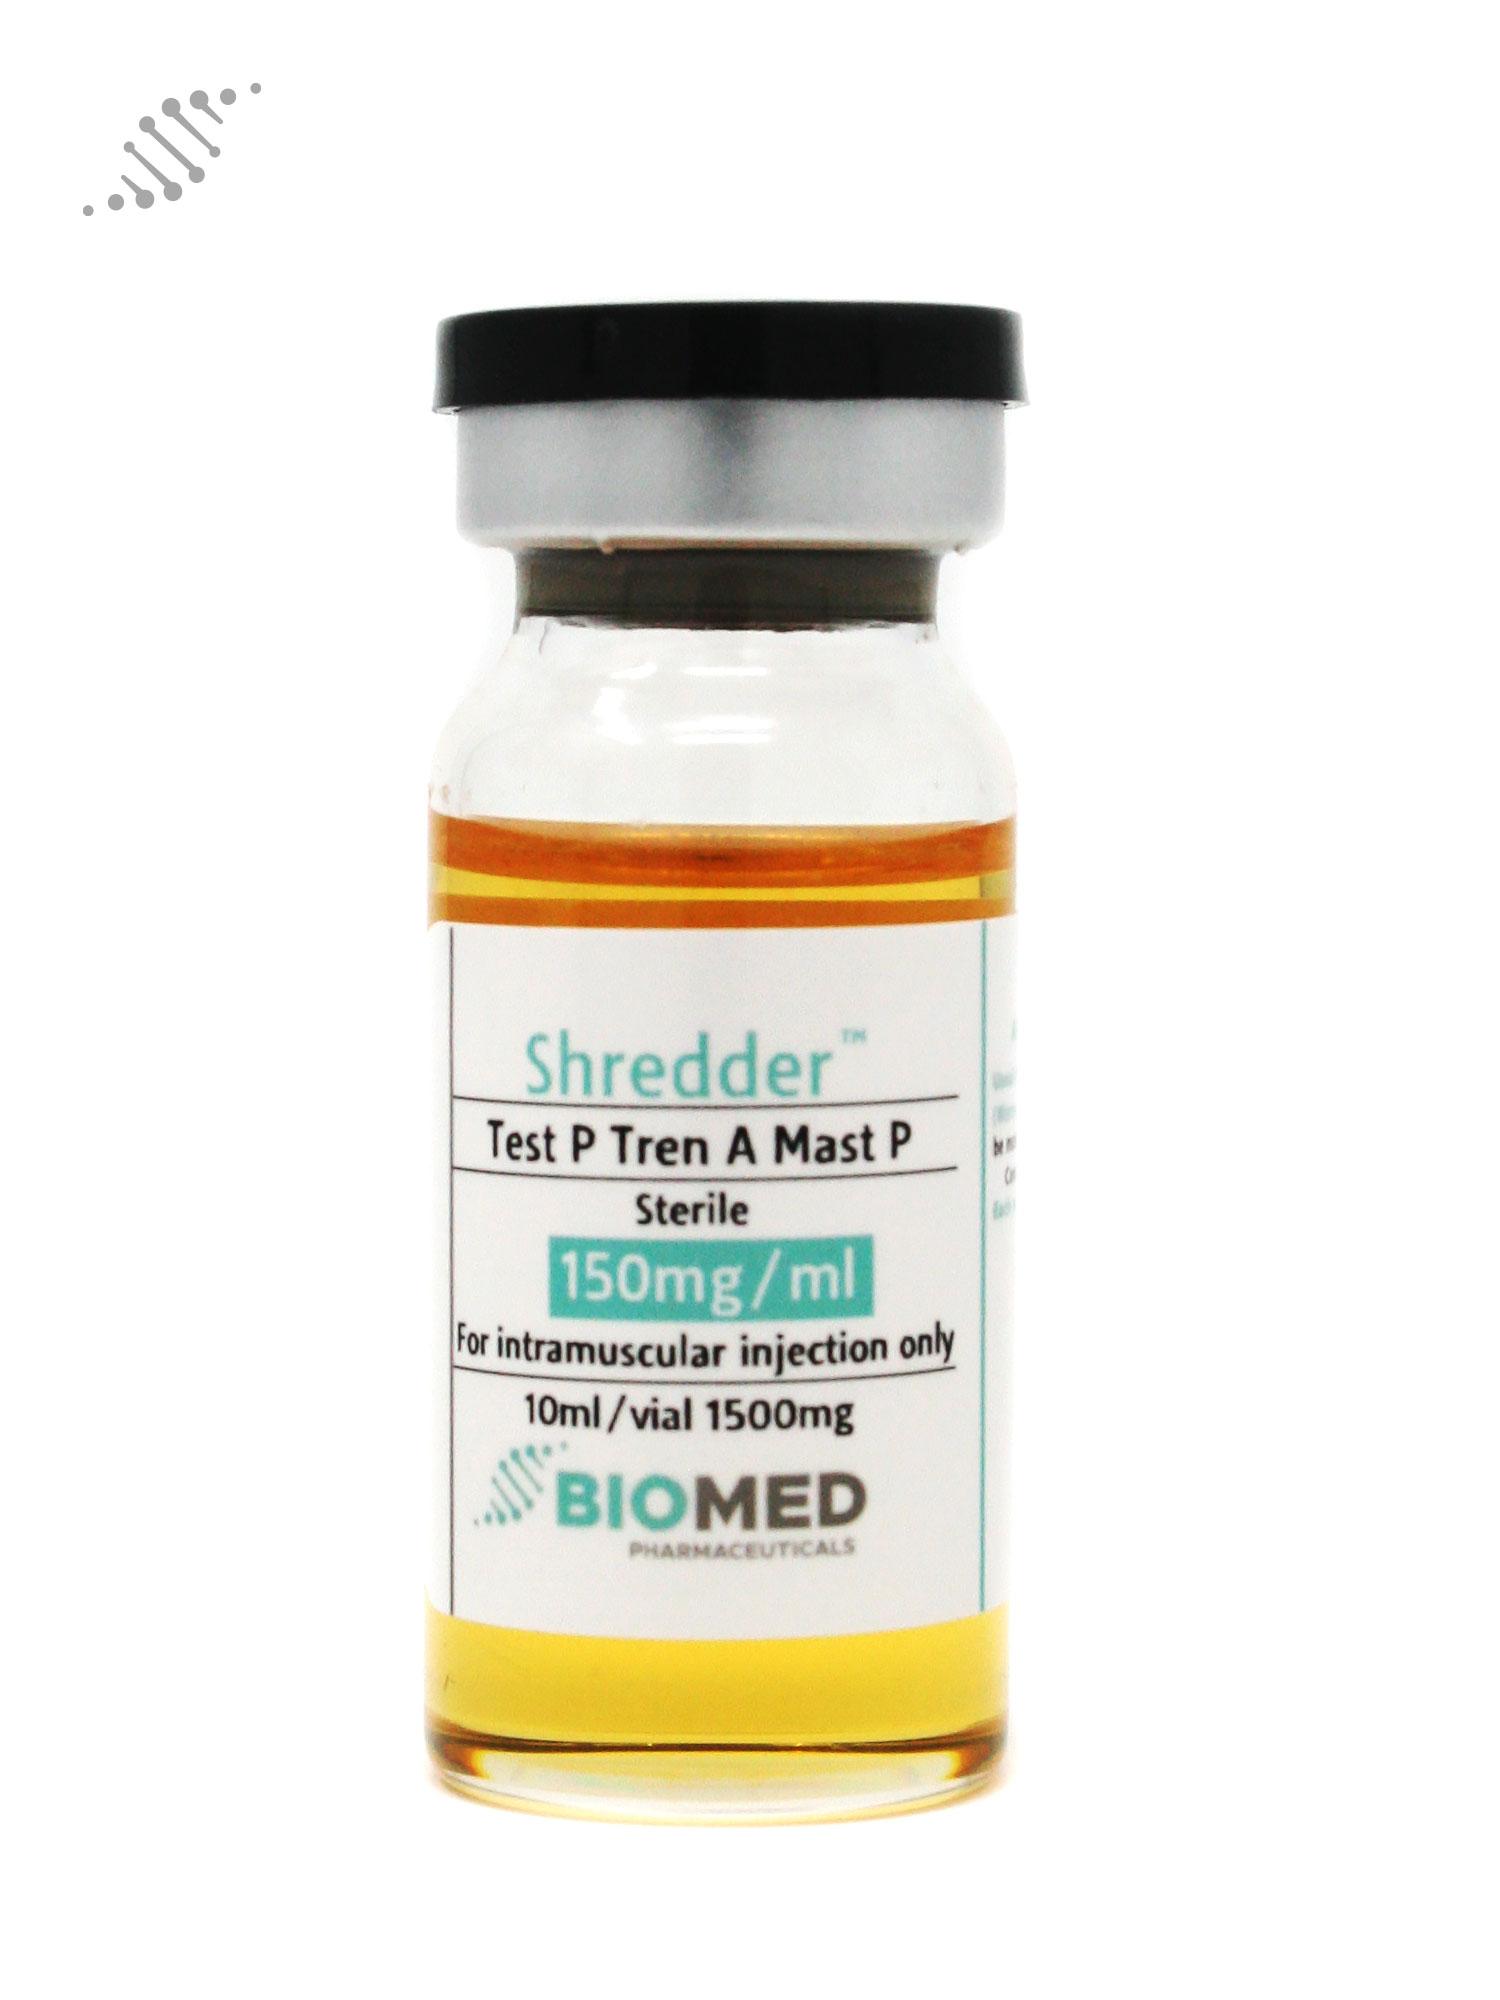 Shredder Test P Tren A Mast P 150ml